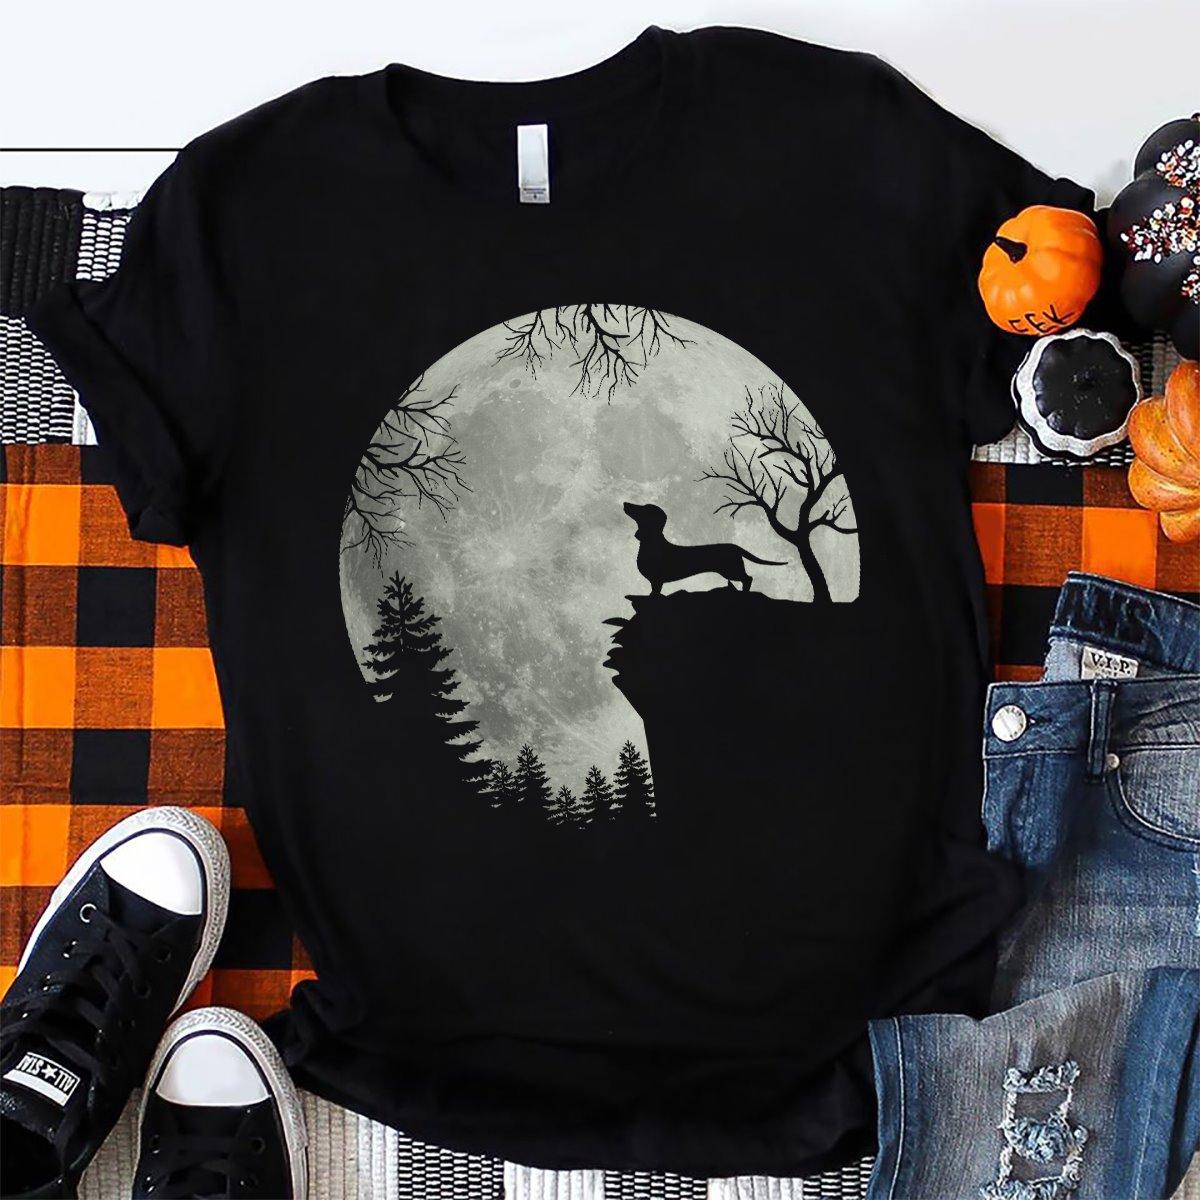 Funny Halloween Shirt, Dachshund Lover T-Shirt KM3008